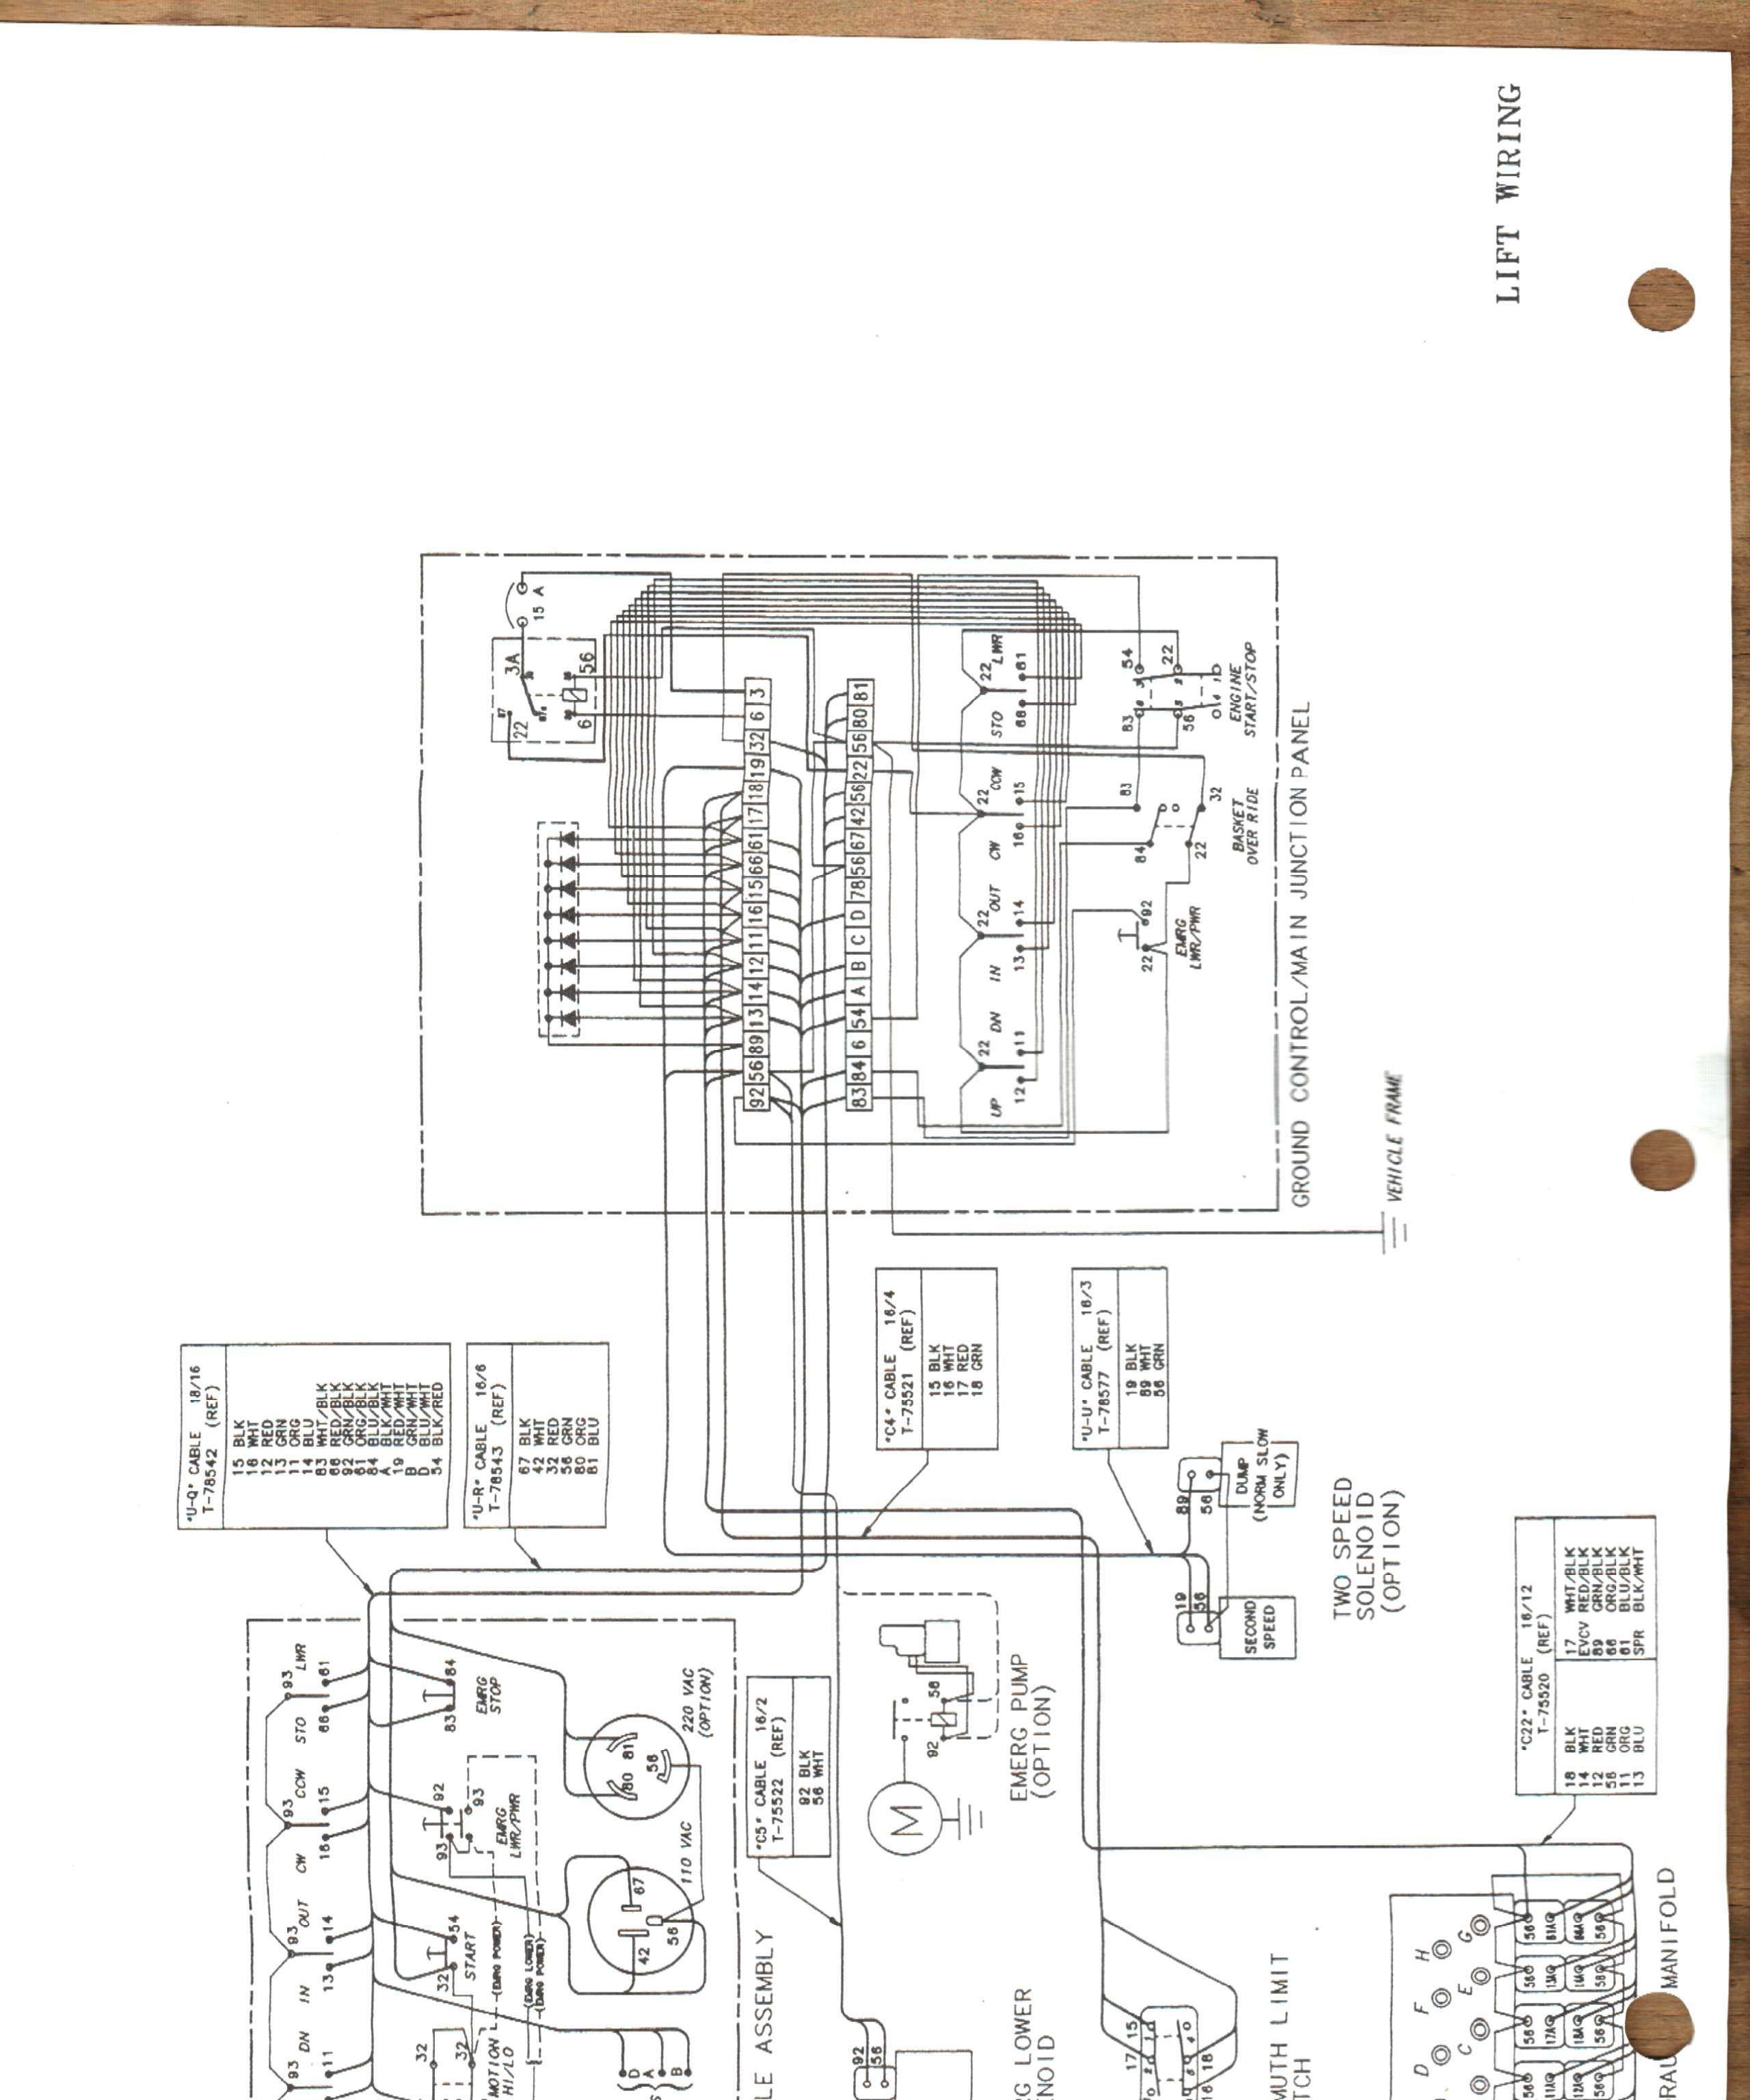 Wiring Diagram Cars Trucks Wiring Diagram Cars Trucks Truck Horn Wiring Wiring Diagrams Bucket Truck Cars Trucks Truck Horn